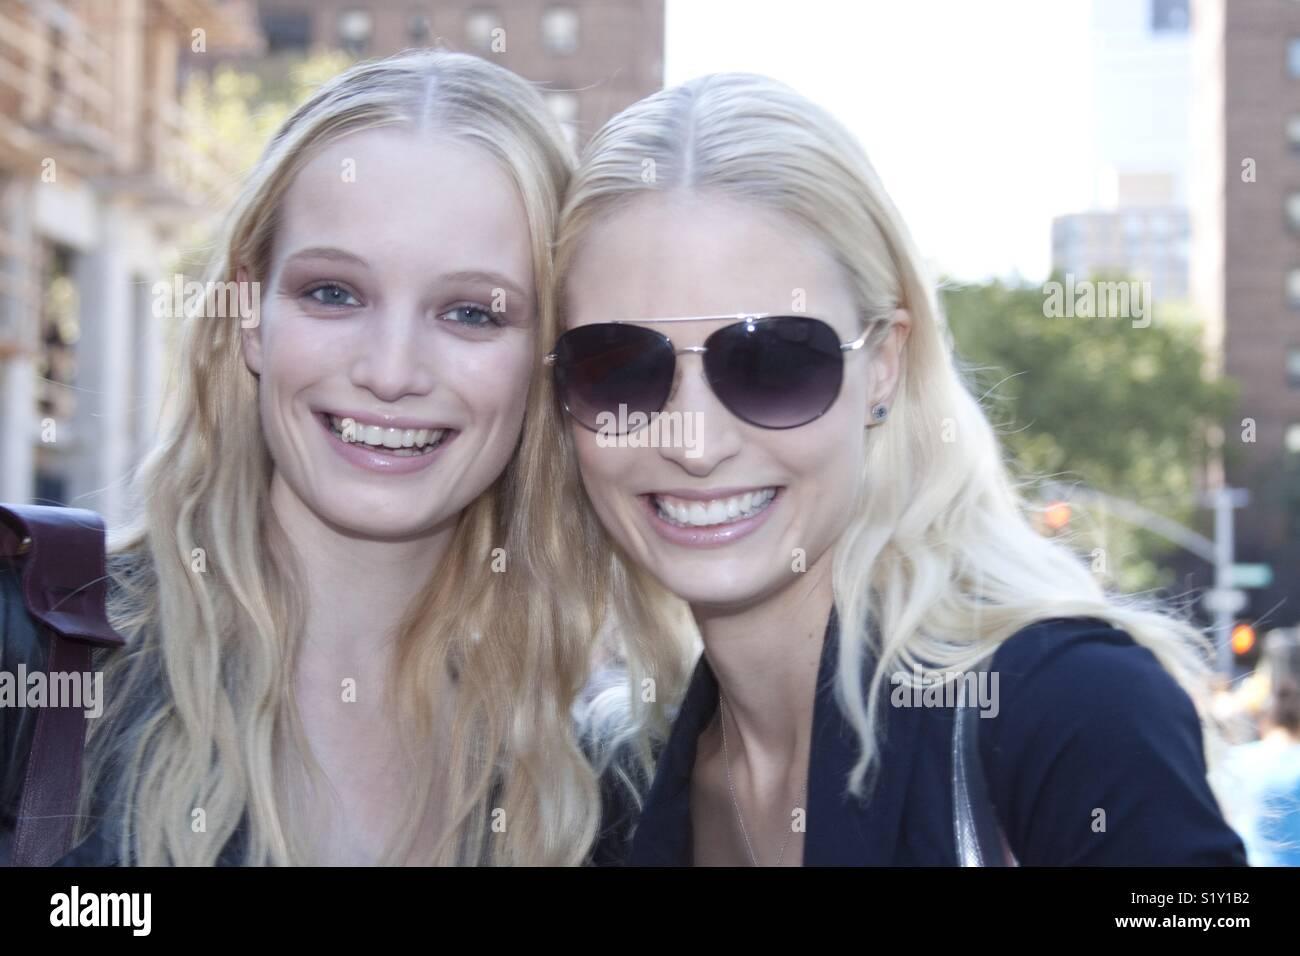 Two beautiful fashion models - Stock Image